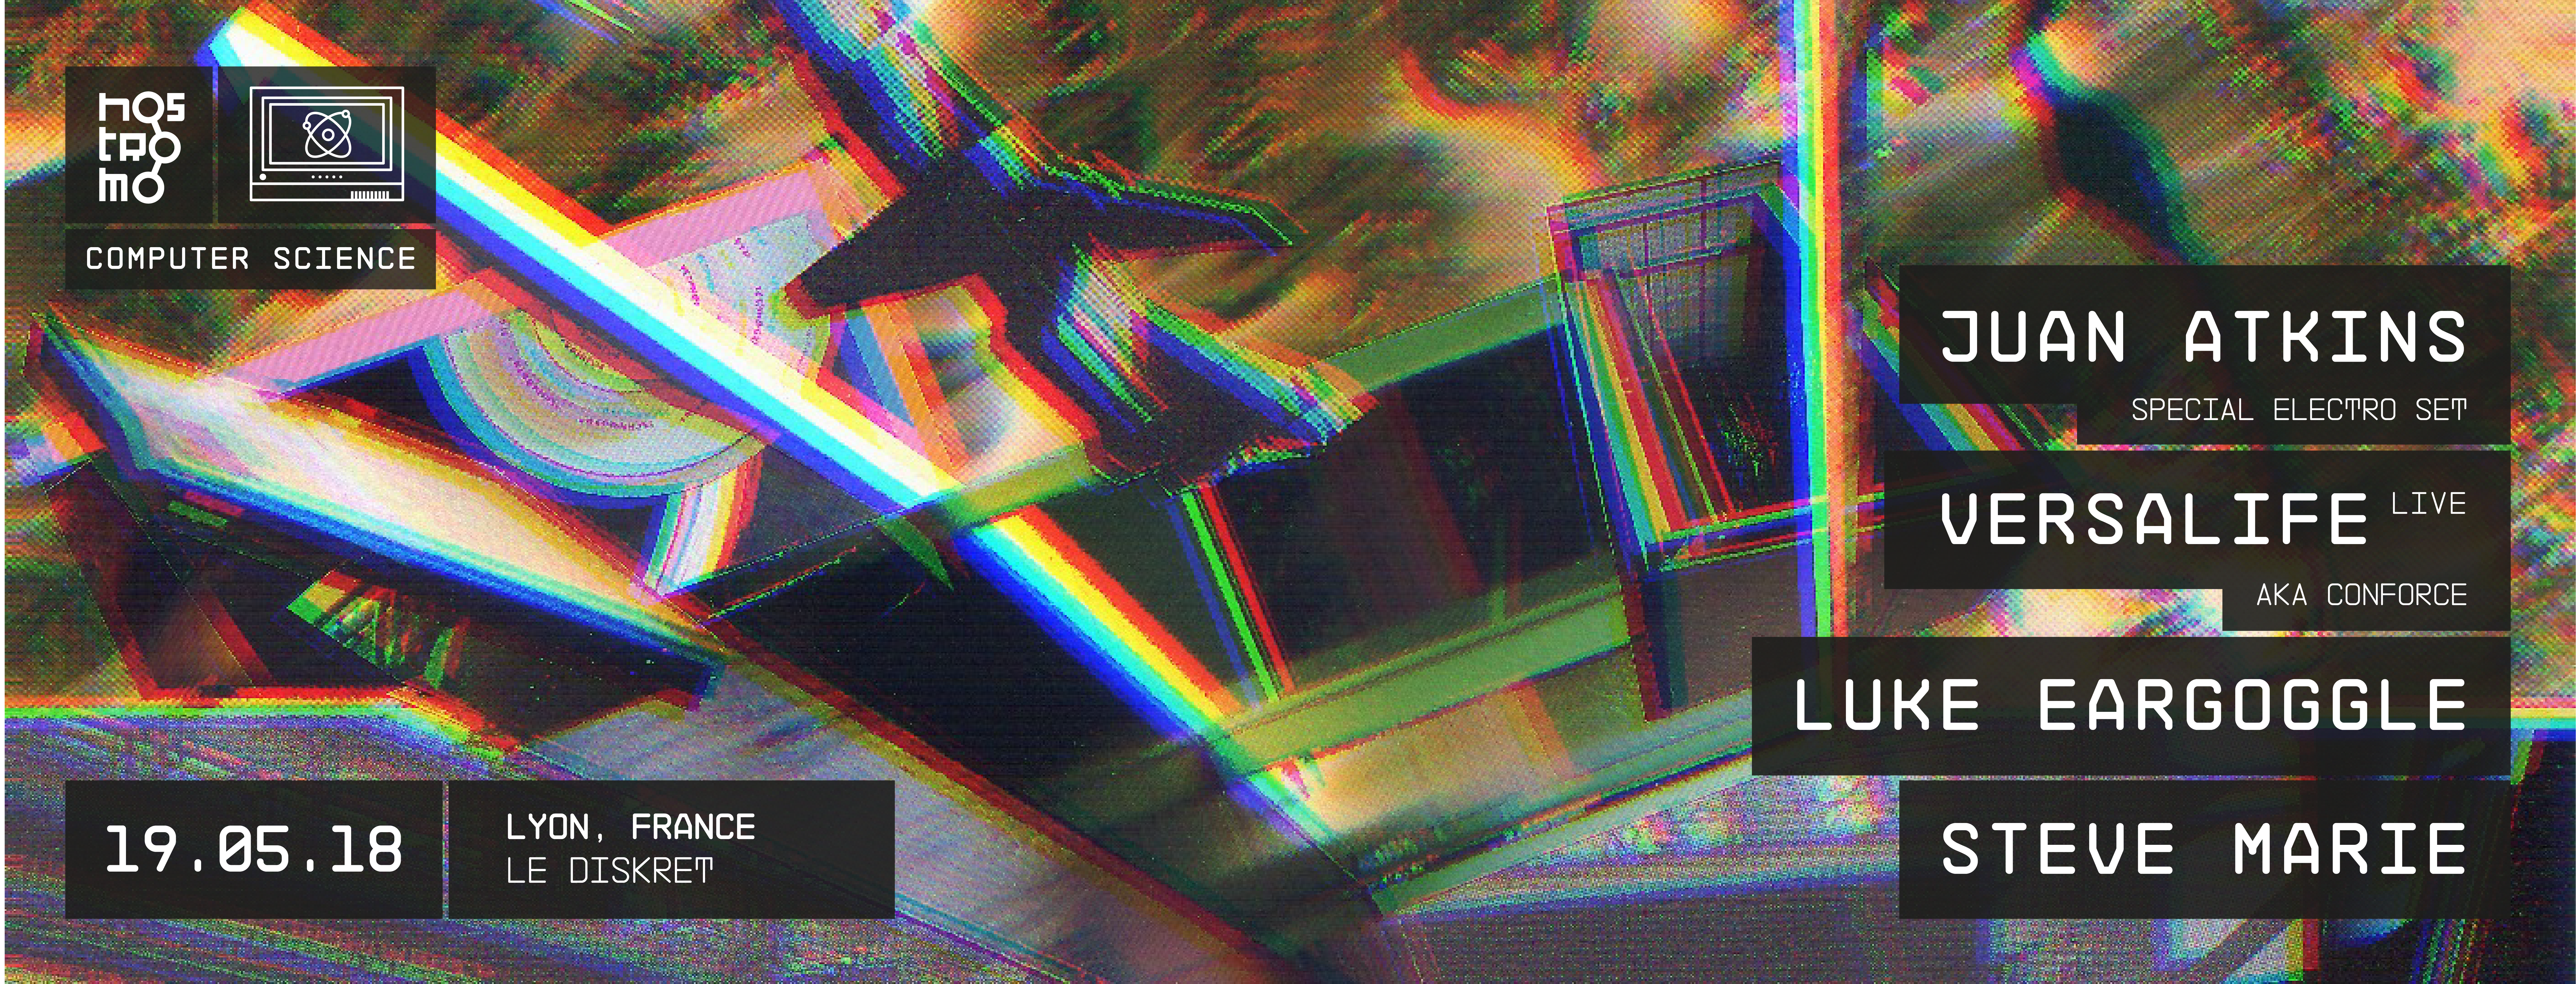 Nostromo Computer Science w/ Juan Atkins